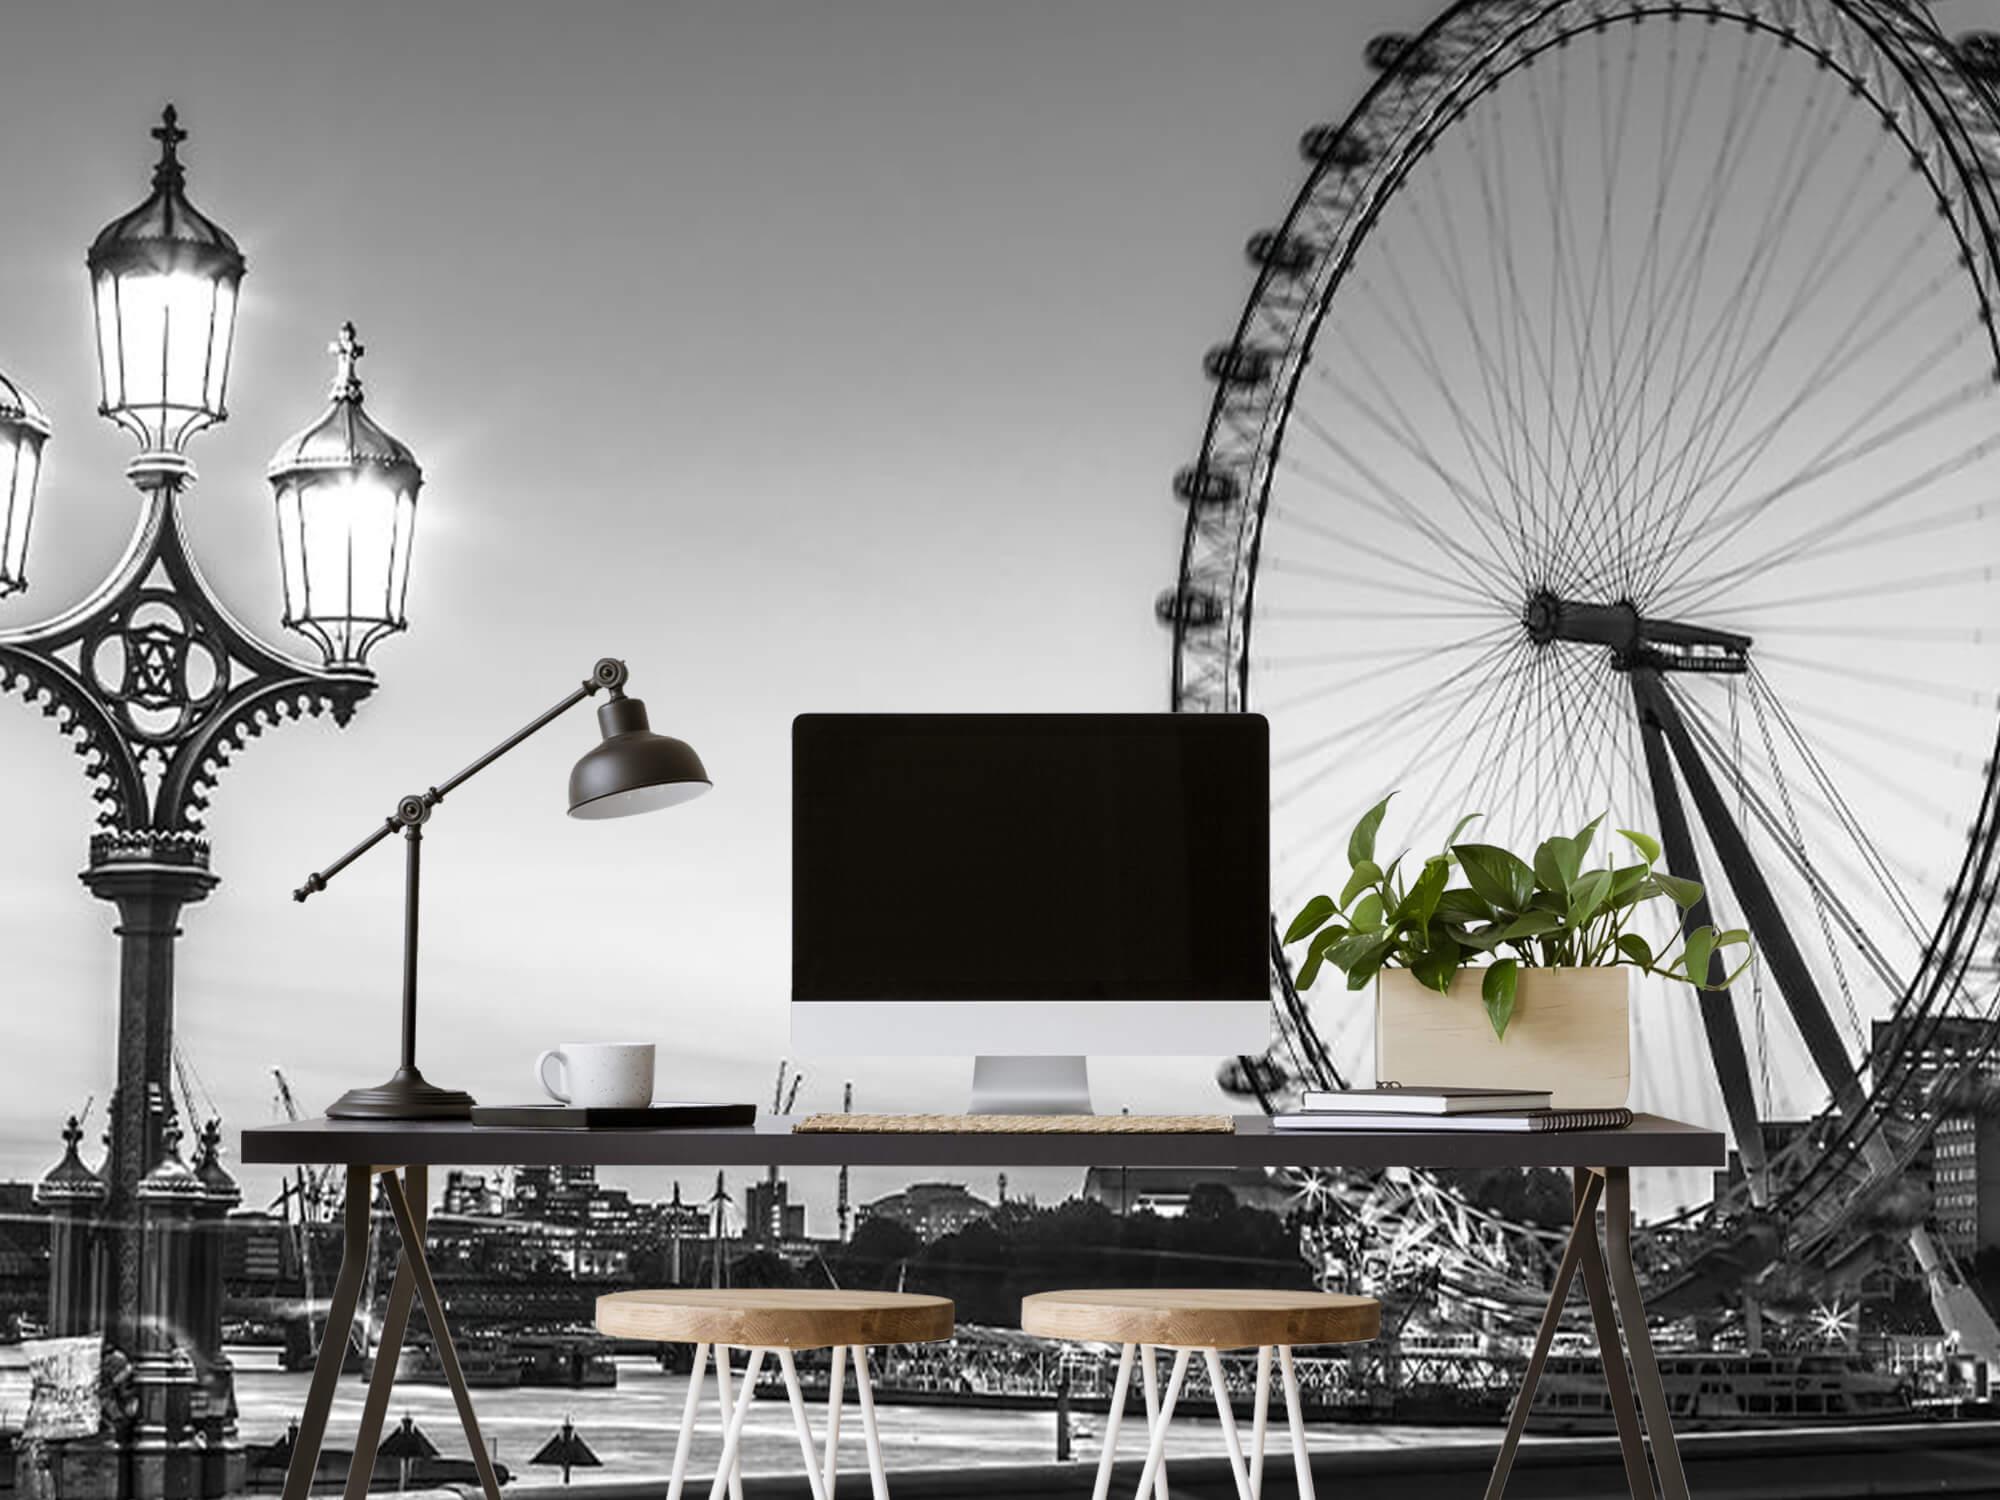 Ferris wheel black and white 11